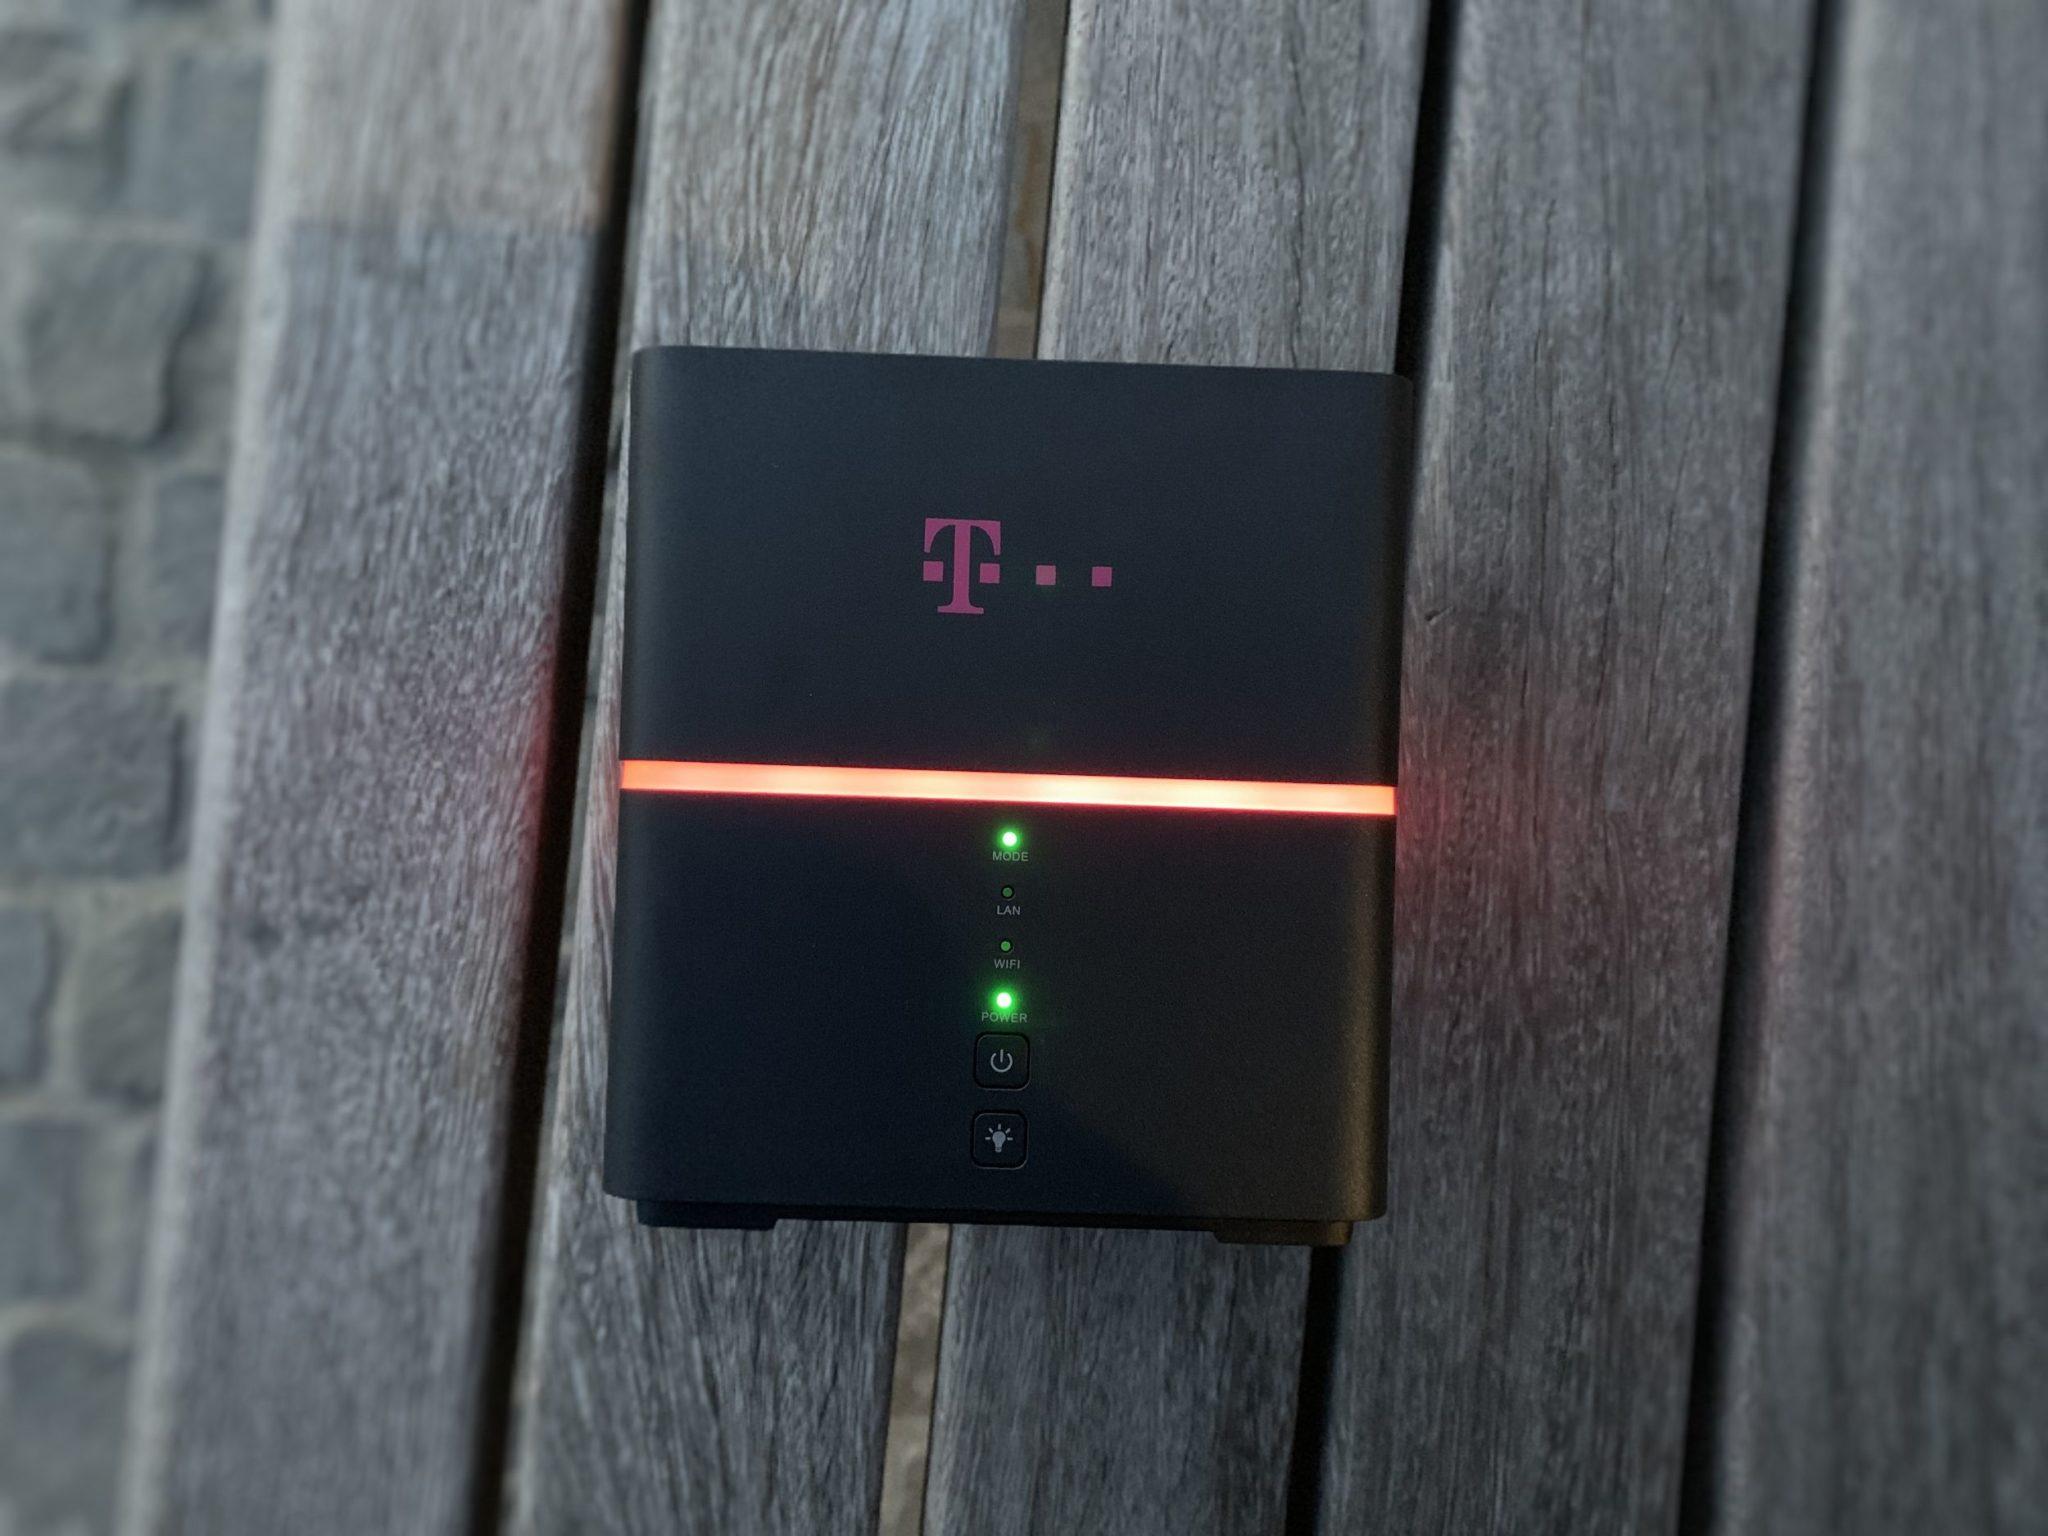 telekom speedbox t mobile homenet box lte router im. Black Bedroom Furniture Sets. Home Design Ideas